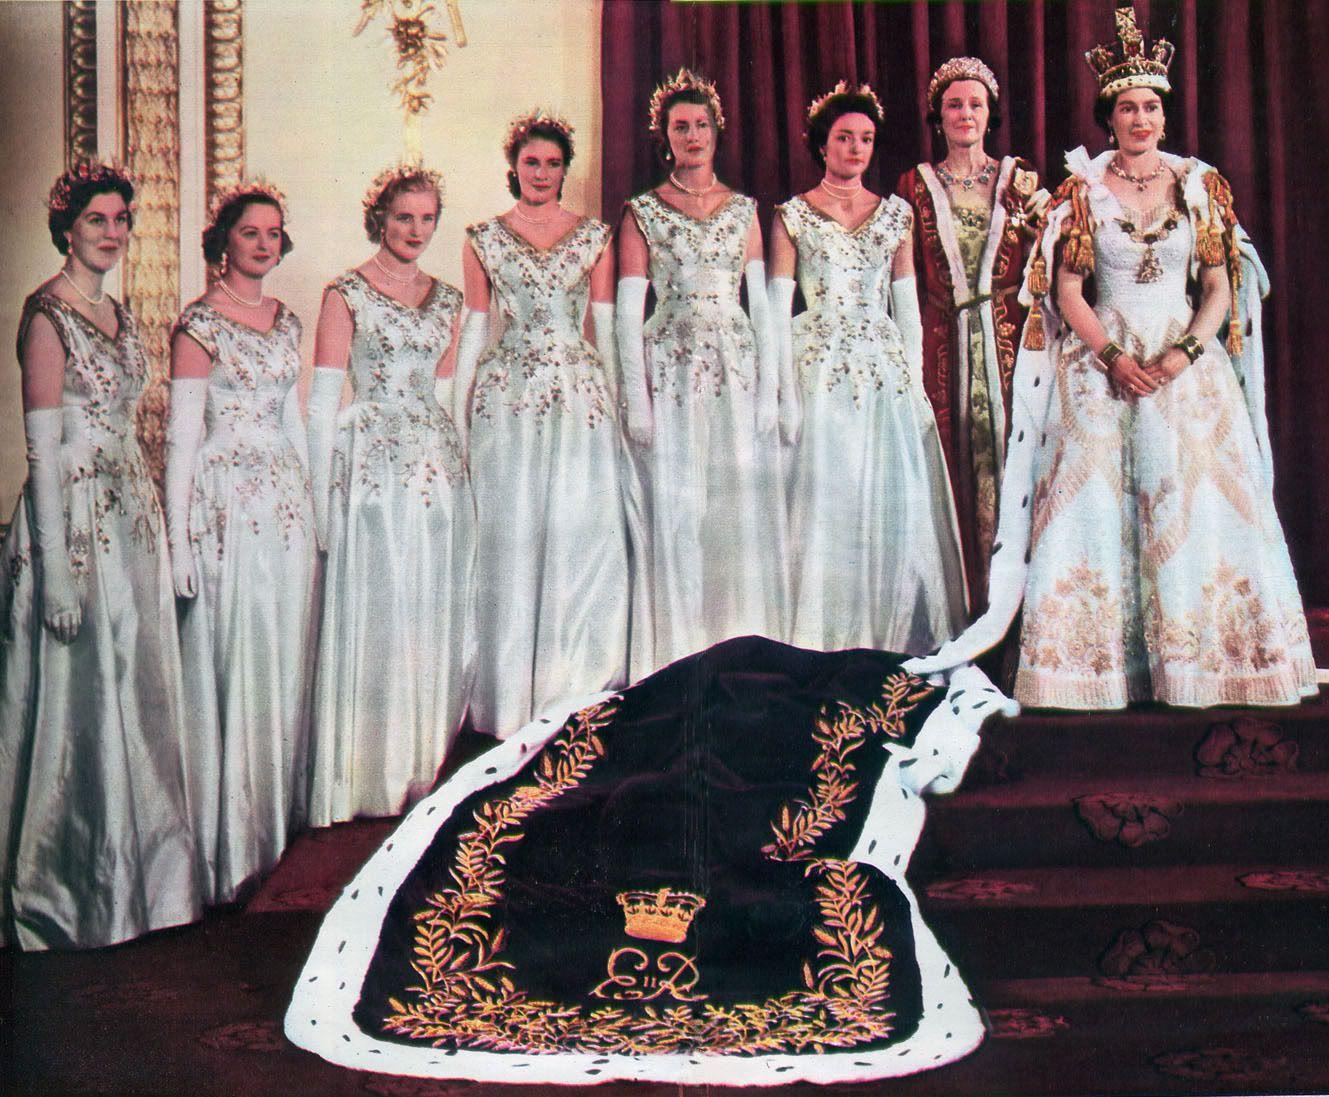 Maids of Honor coronation